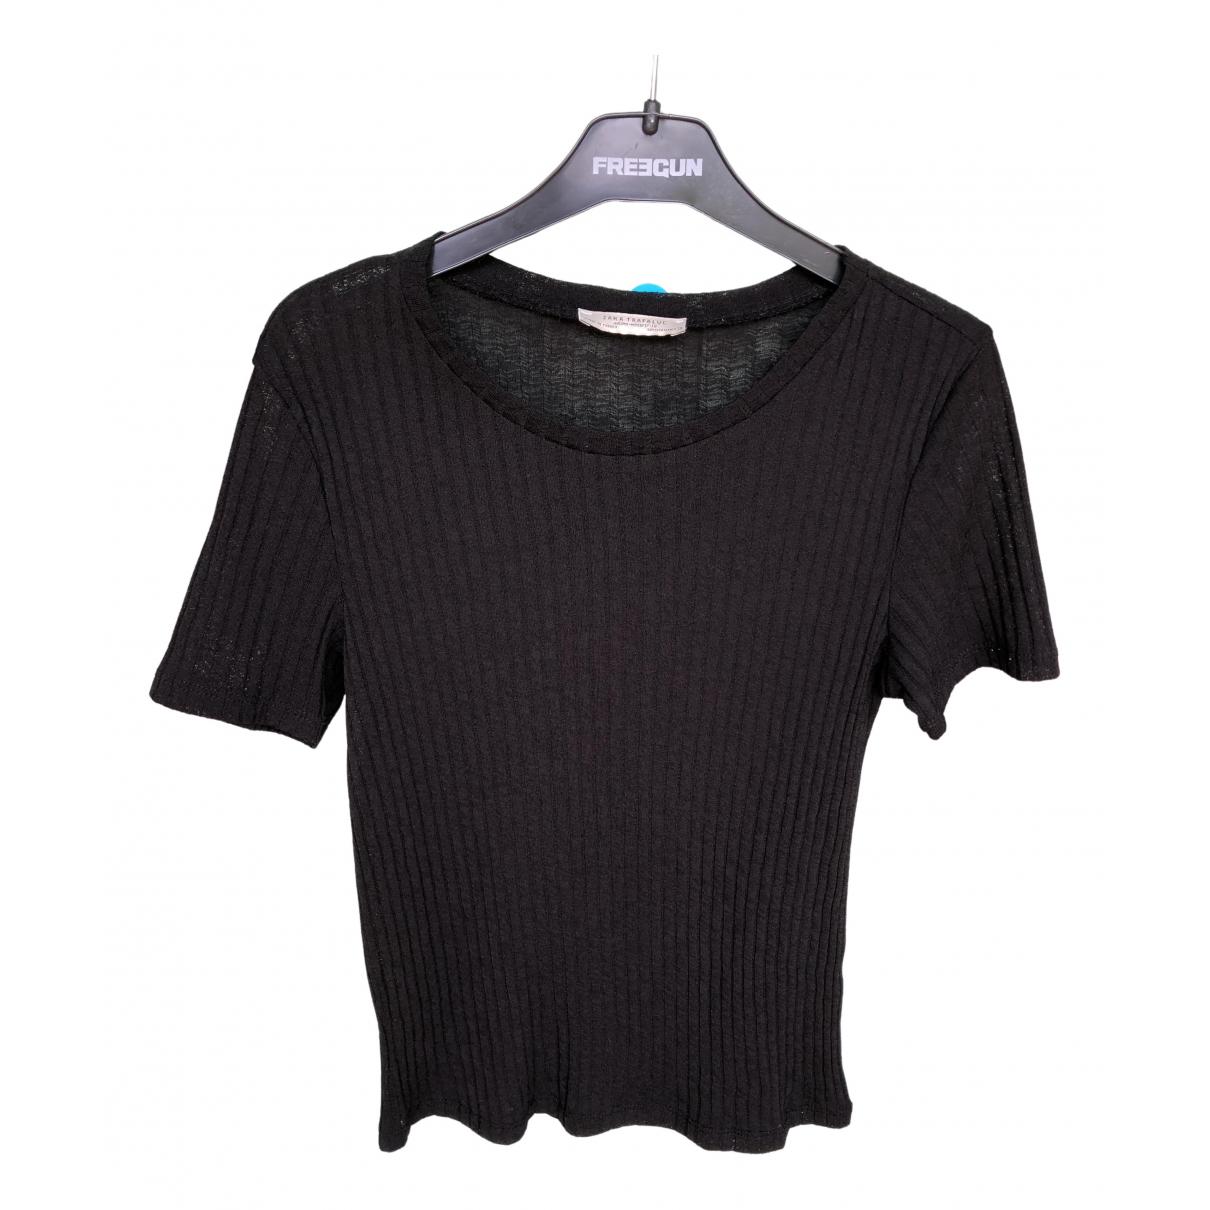 Zara \N Black Cotton  top for Women S International